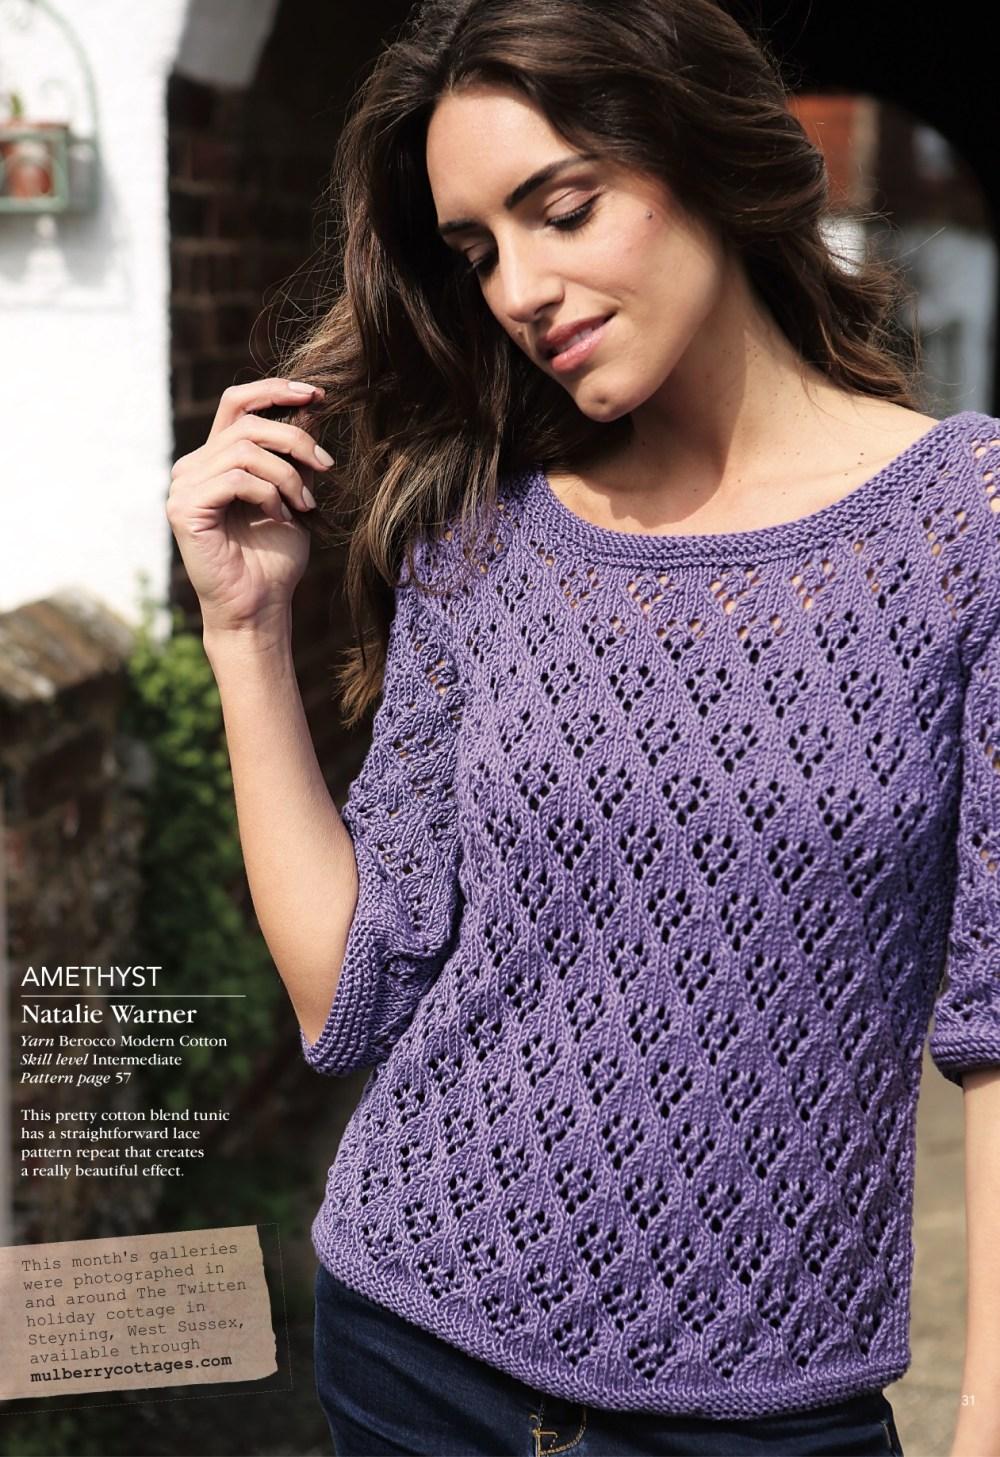 natalie warner amethyst tunic knitting magazine 2018